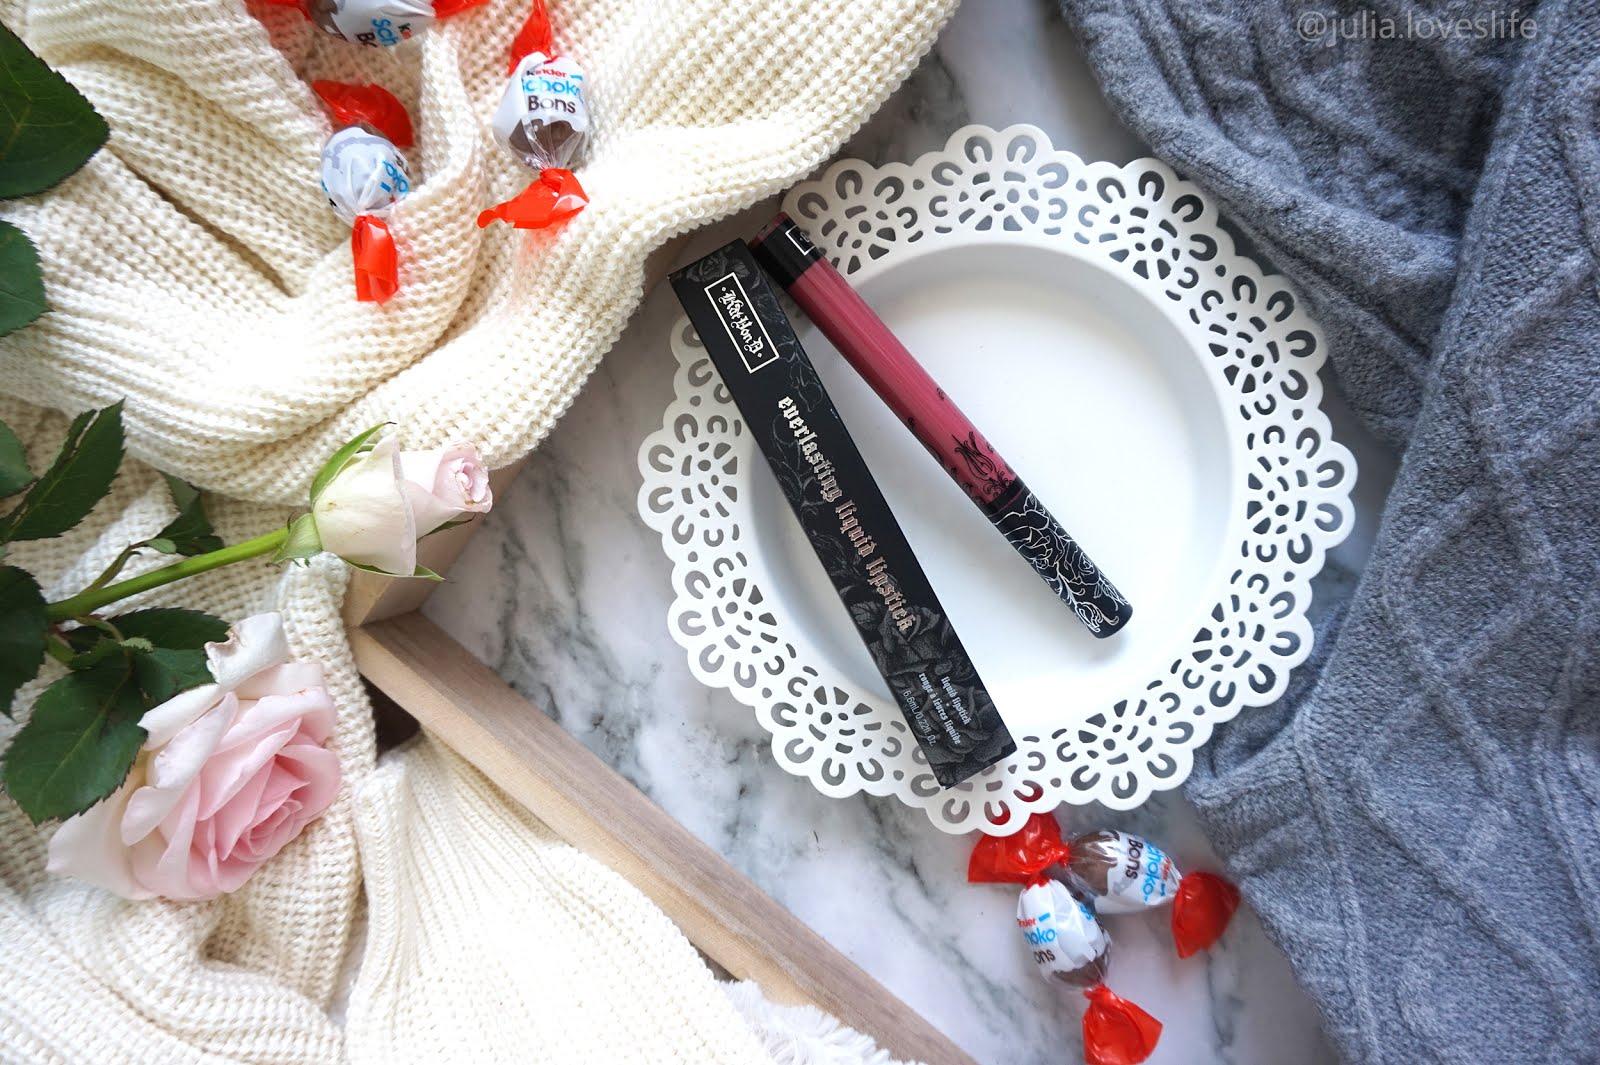 Kat Von D Everlasting Liquid Lipstick | Matowa pomadka | moja opinia + zamiennik | czy warto kupić?